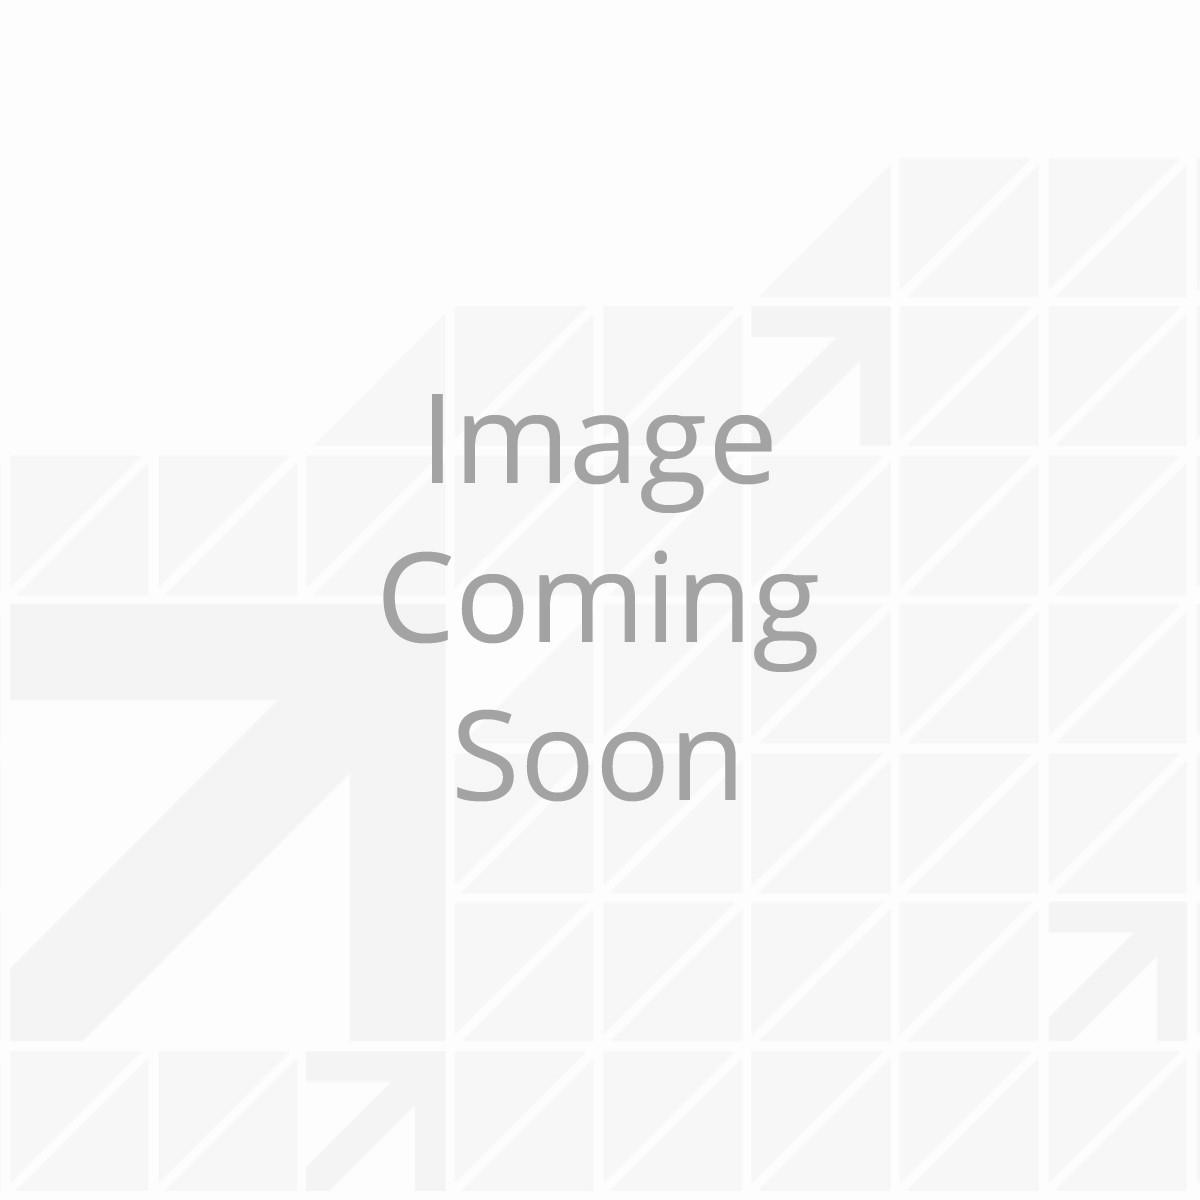 122077_Locking-Nut_001